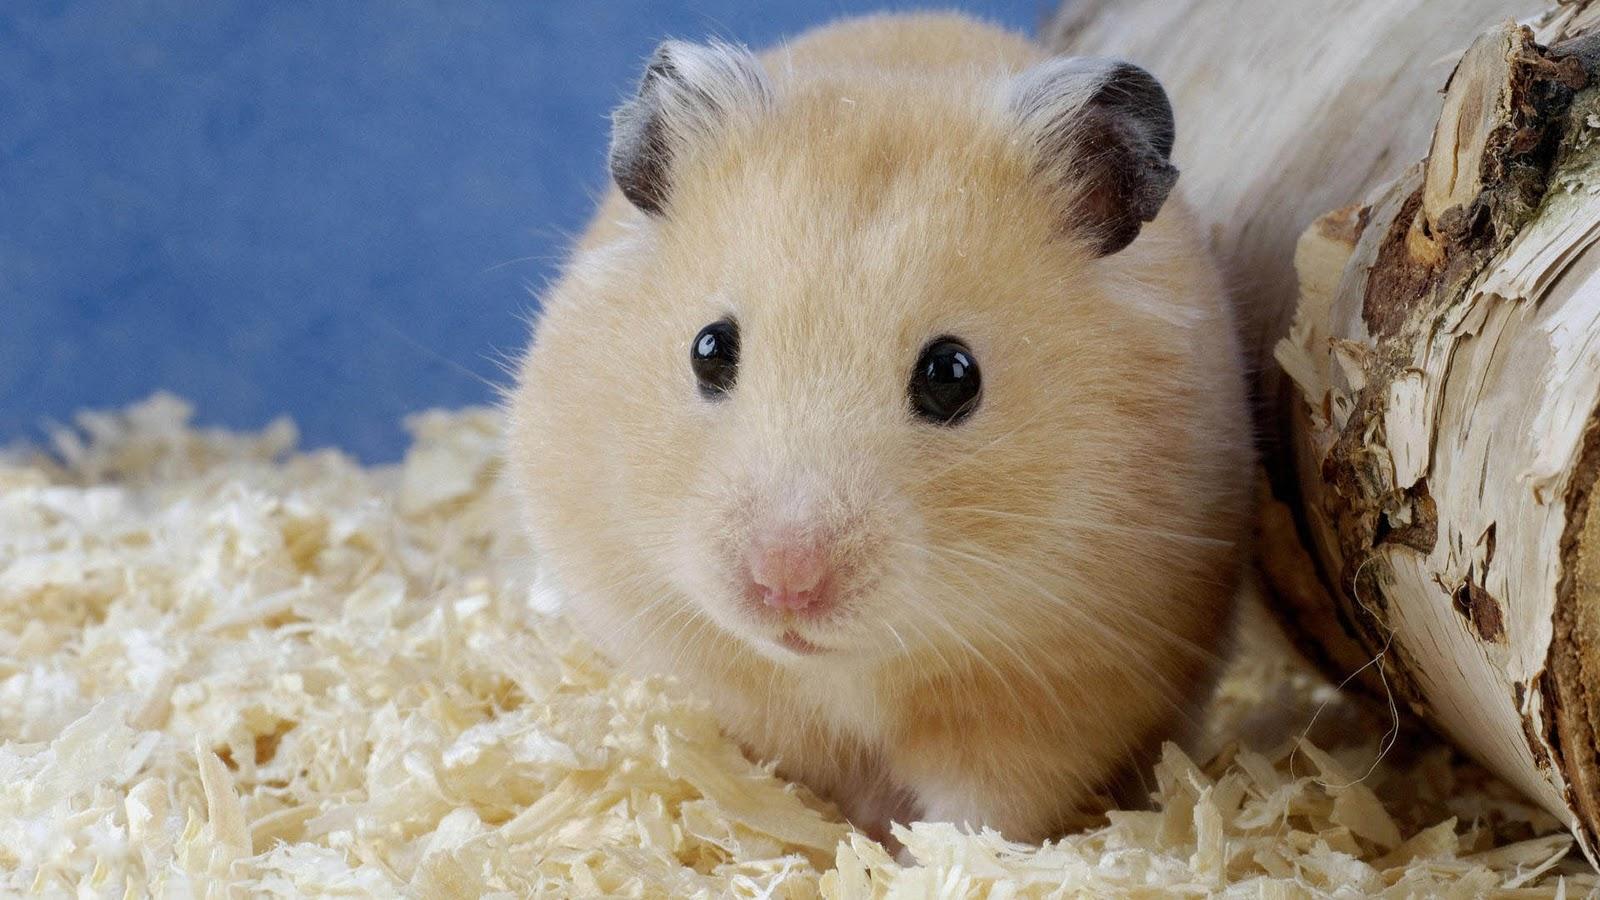 Cute Animal Hamster Wallpaper Background 12203 Wallpaper High 1600x900